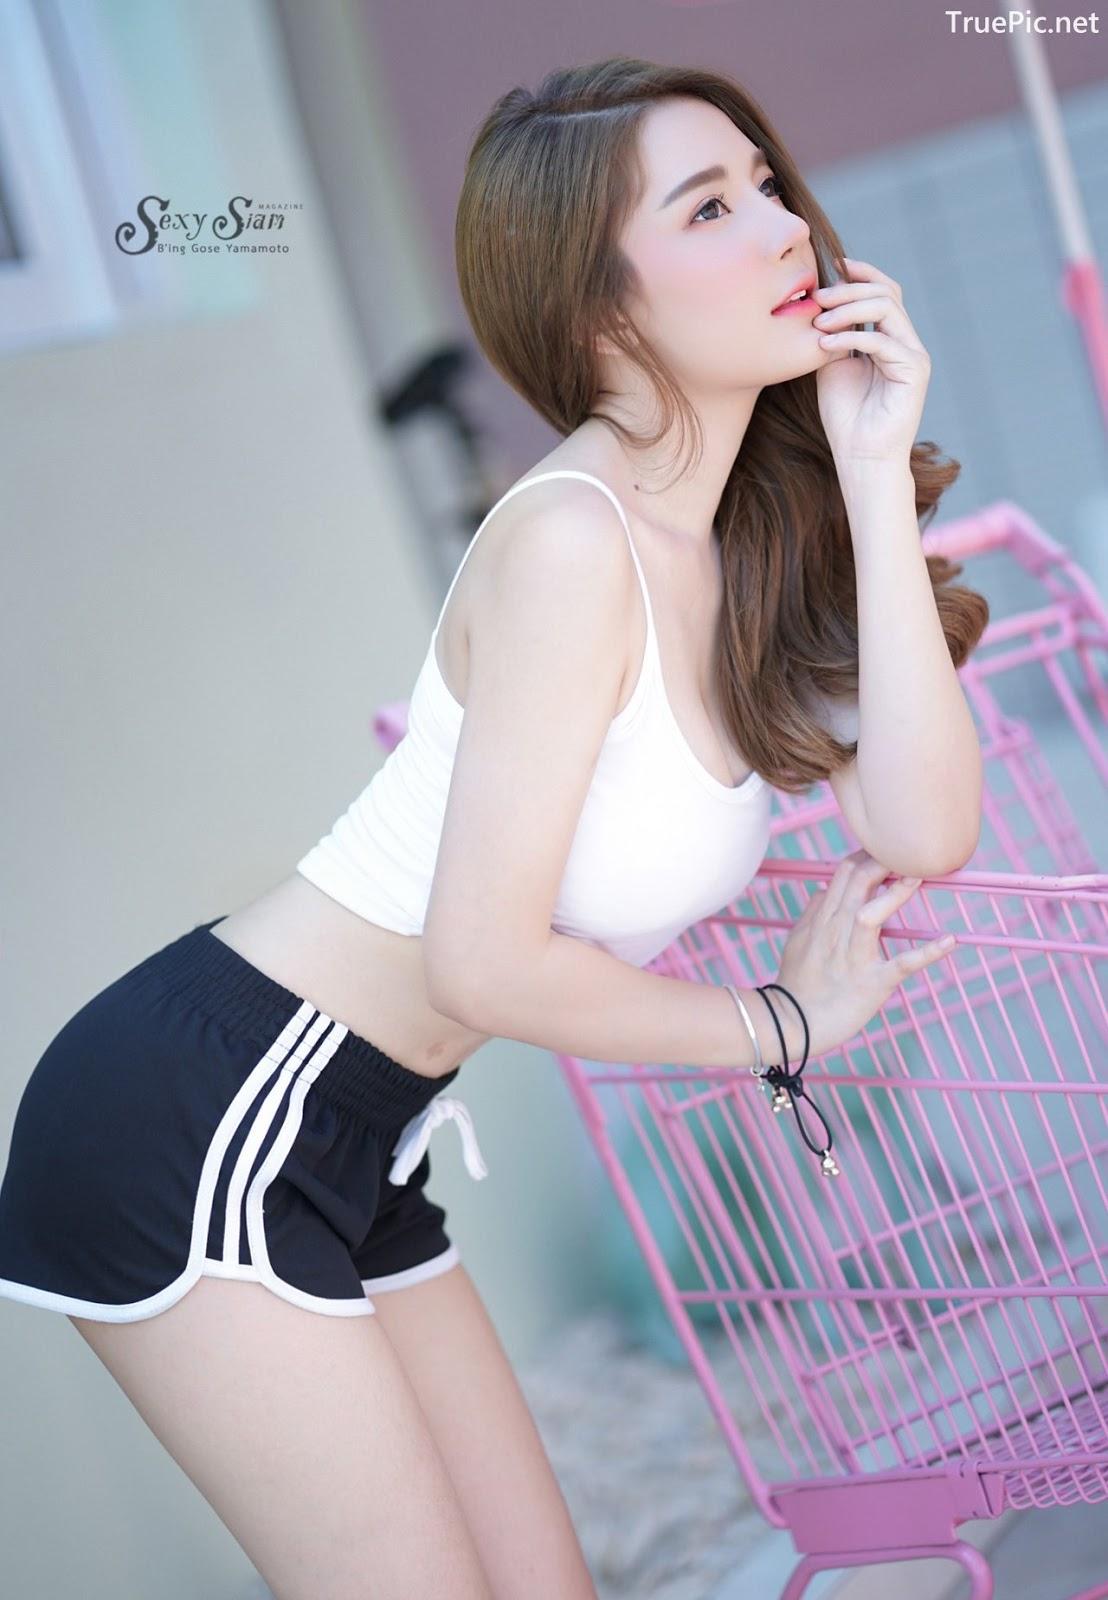 Image Thailand Model - Sasipa Tungmay Jibkrapong - White Crop Top - TruePic.net - Picture-3